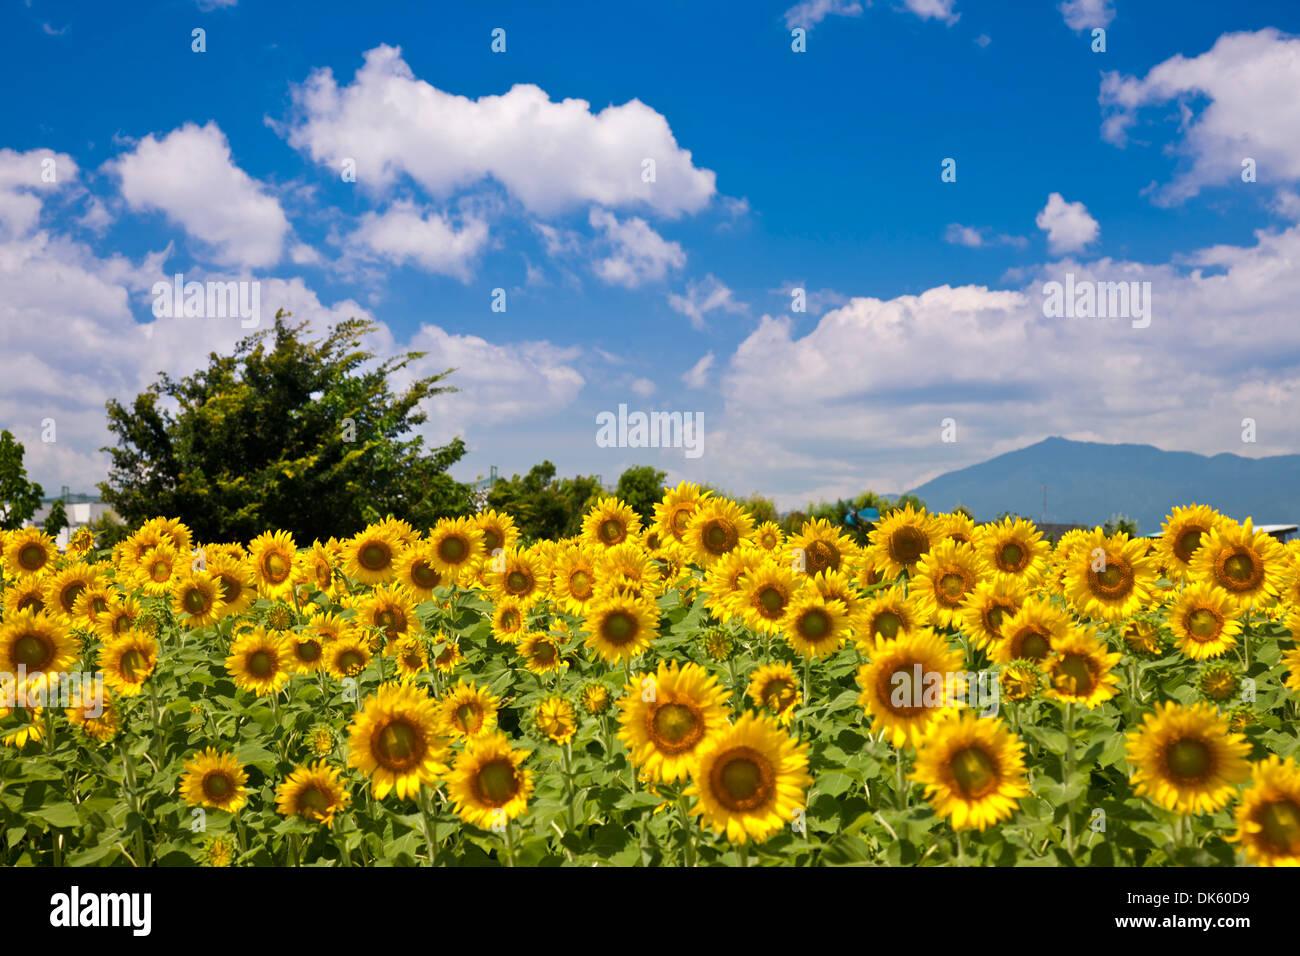 Sunflower Field, Kanagawa Prefecture, Japan Stock Photo